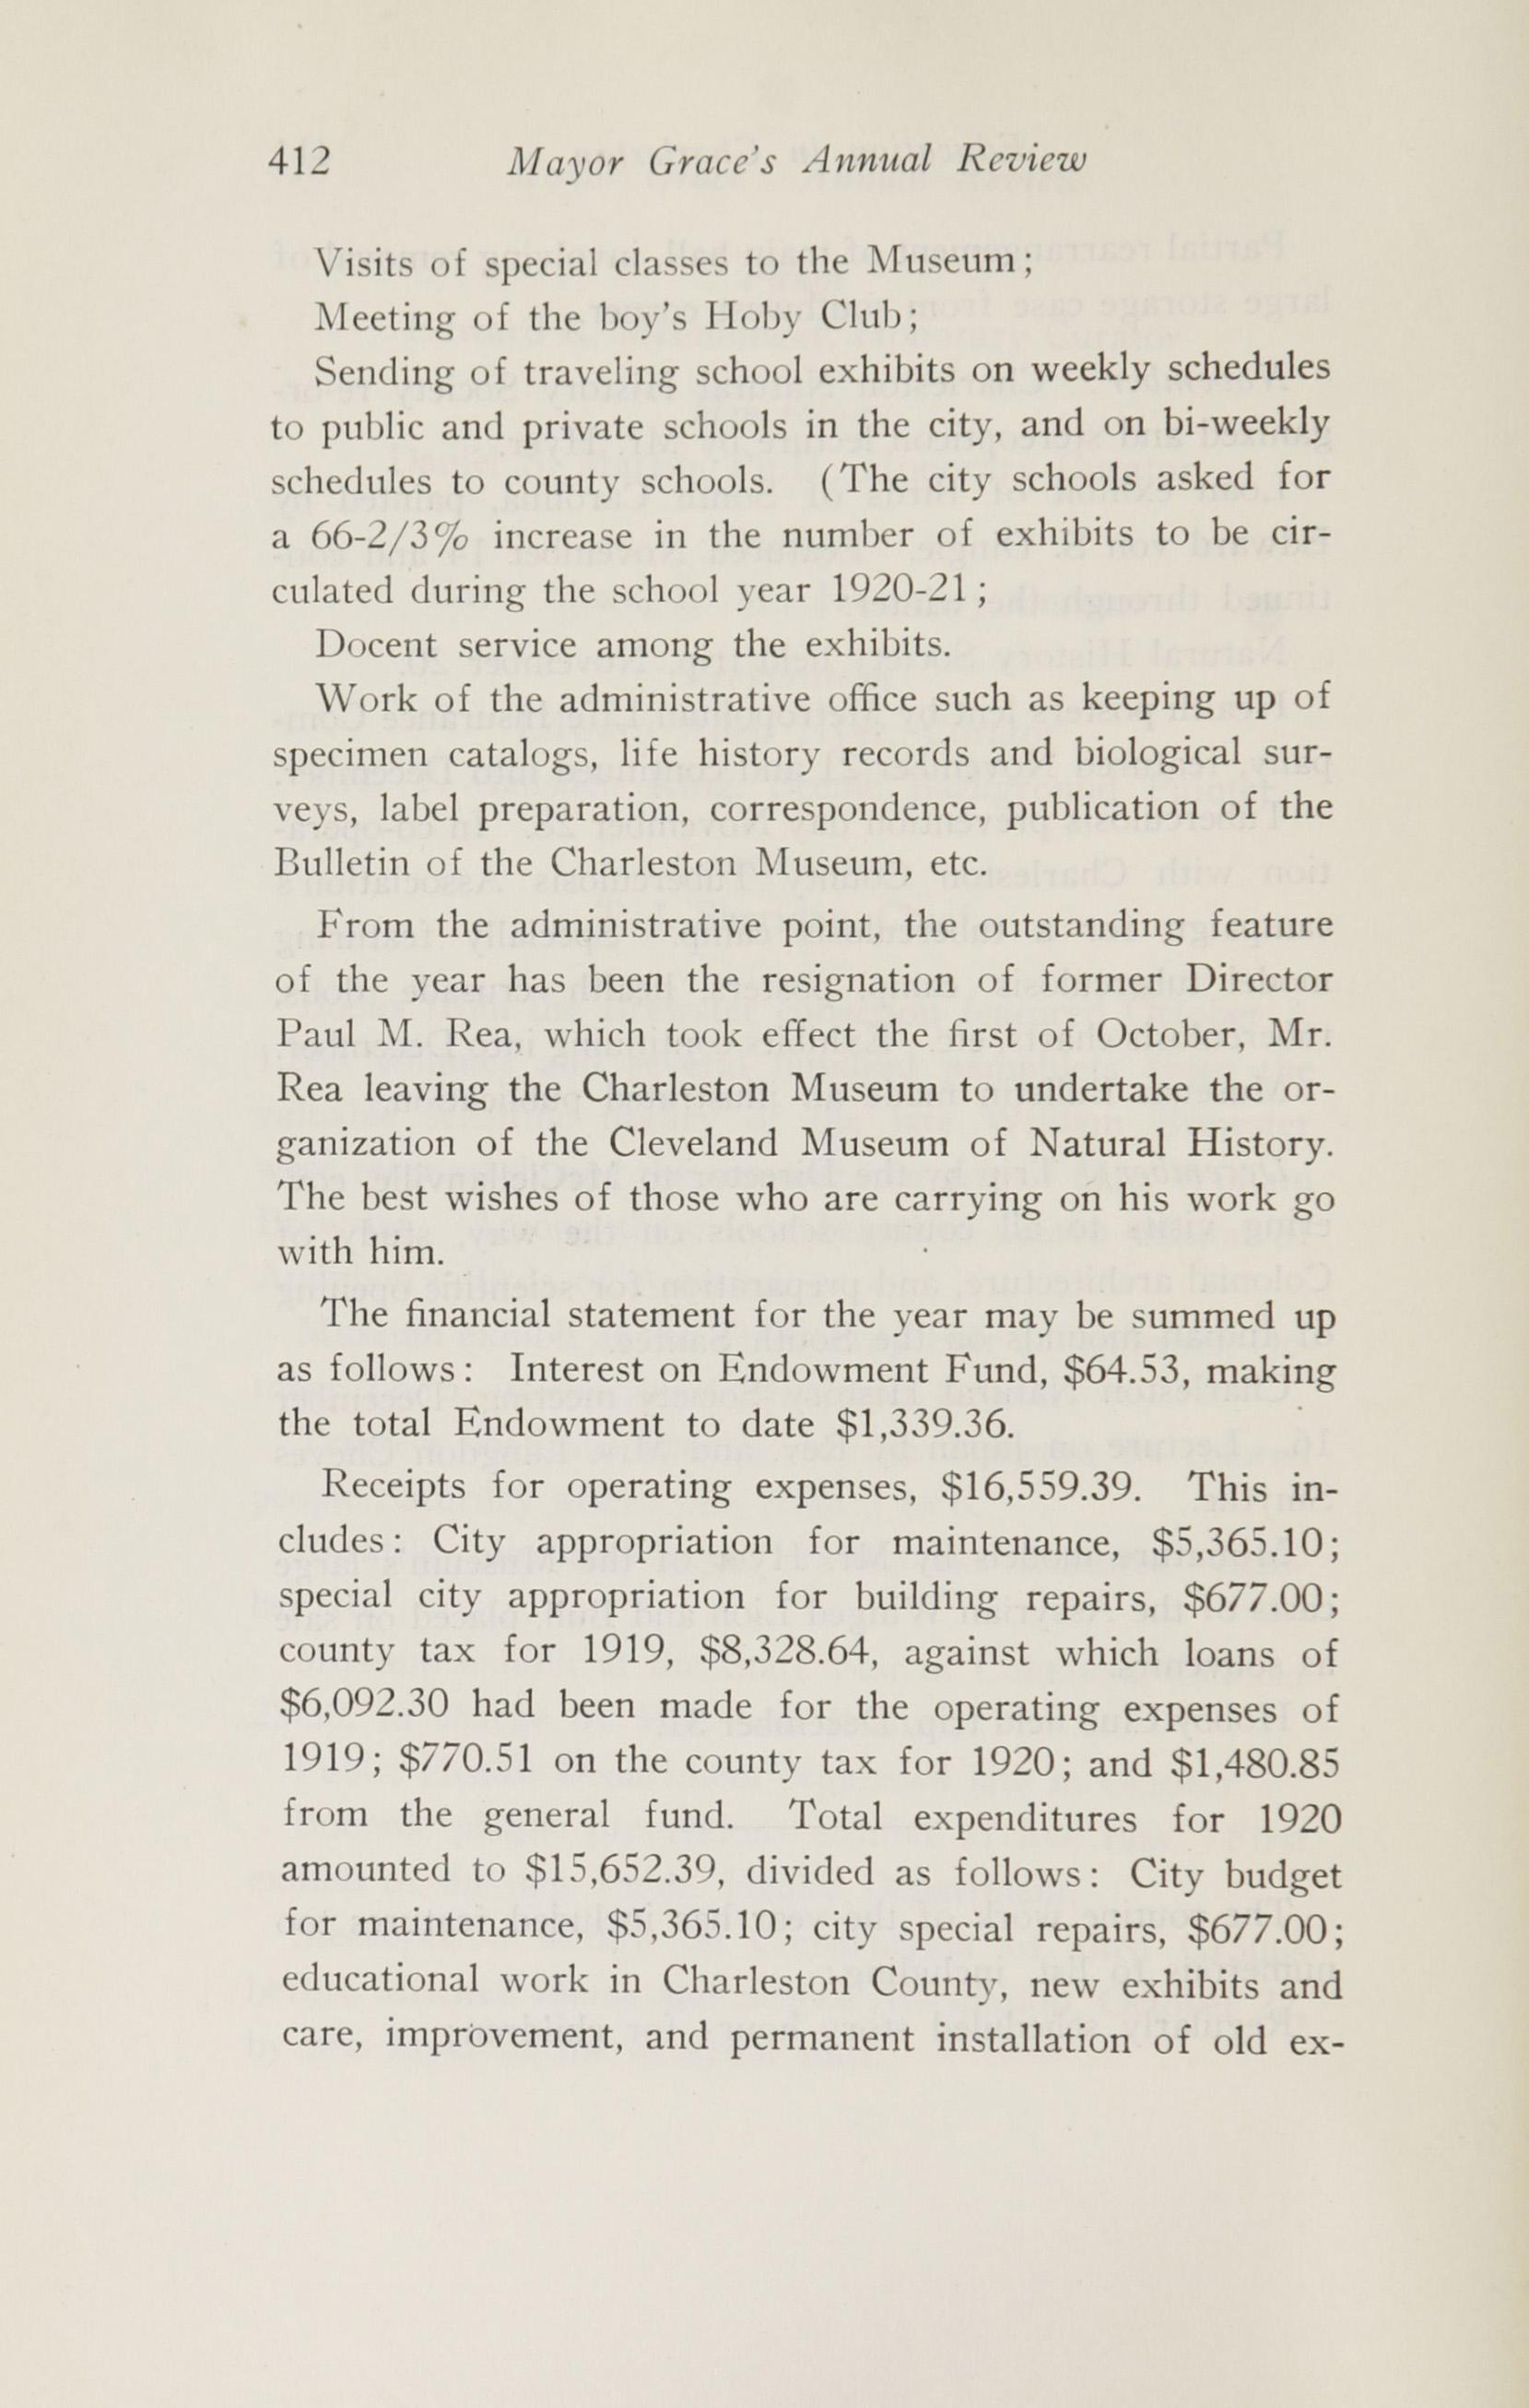 Charleston Yearbook, 1920, page 412